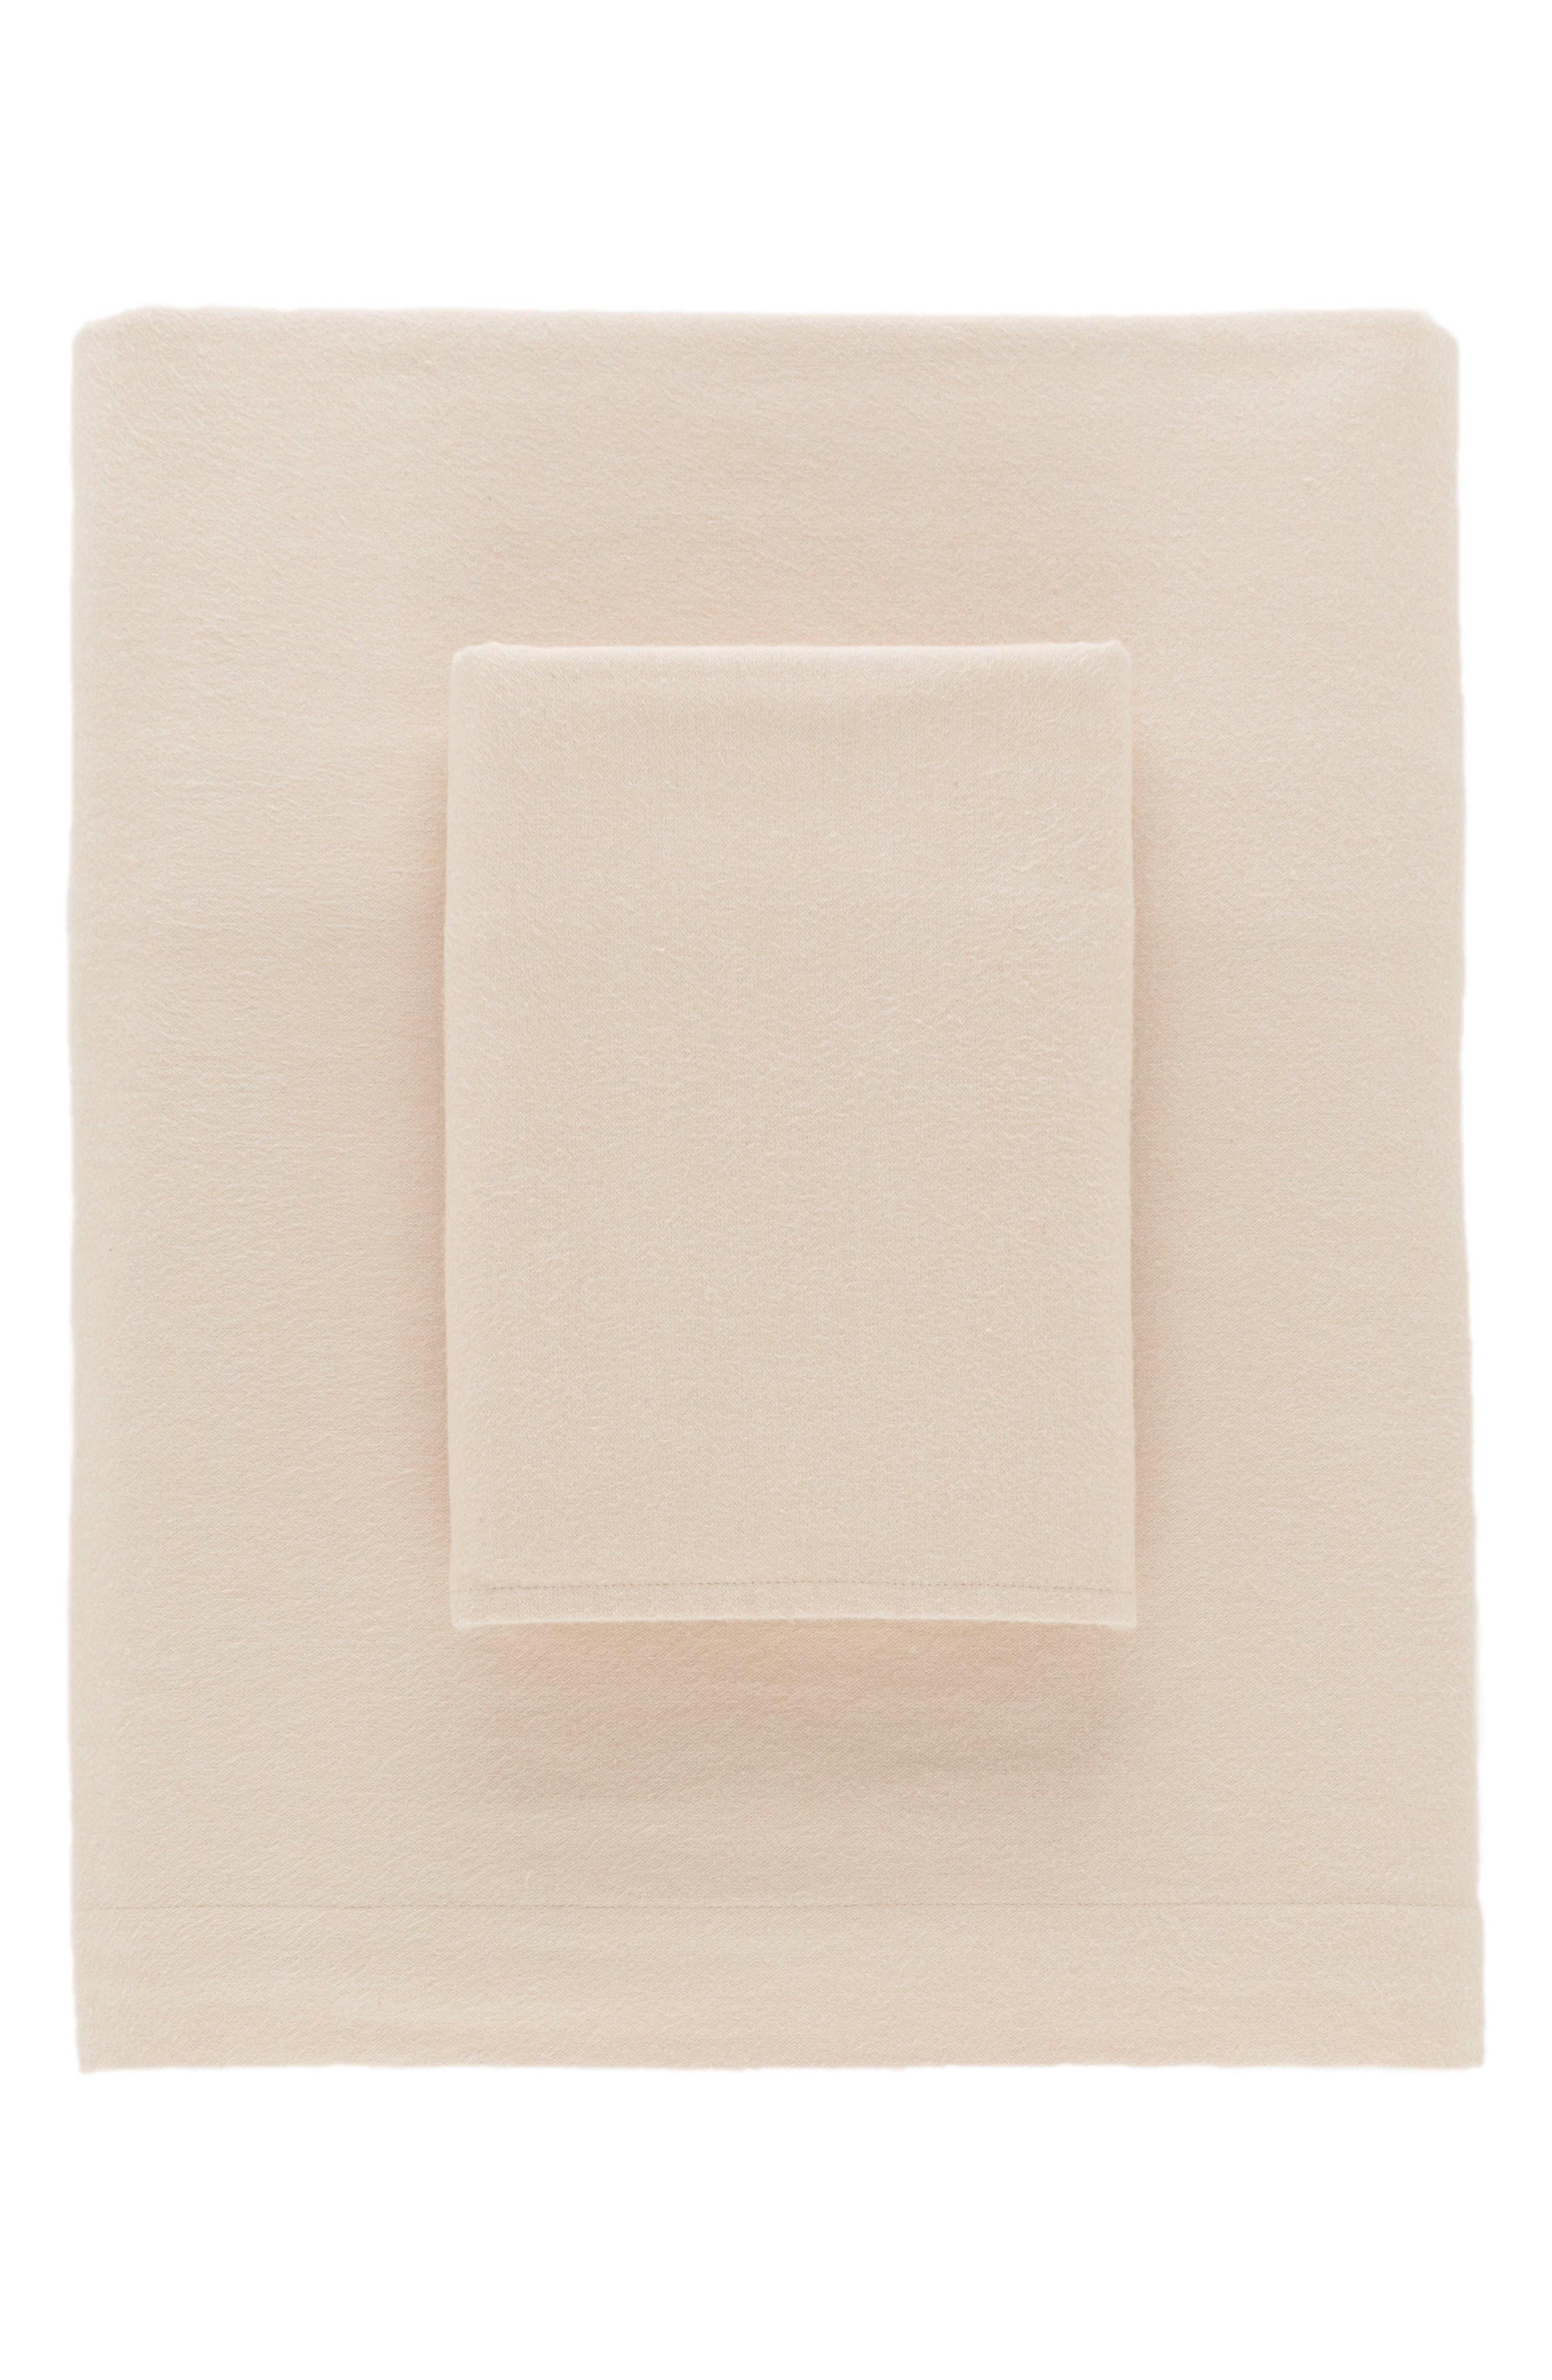 Chambray Flannel Sheet Set,                         Main,                         color, Oatmeal